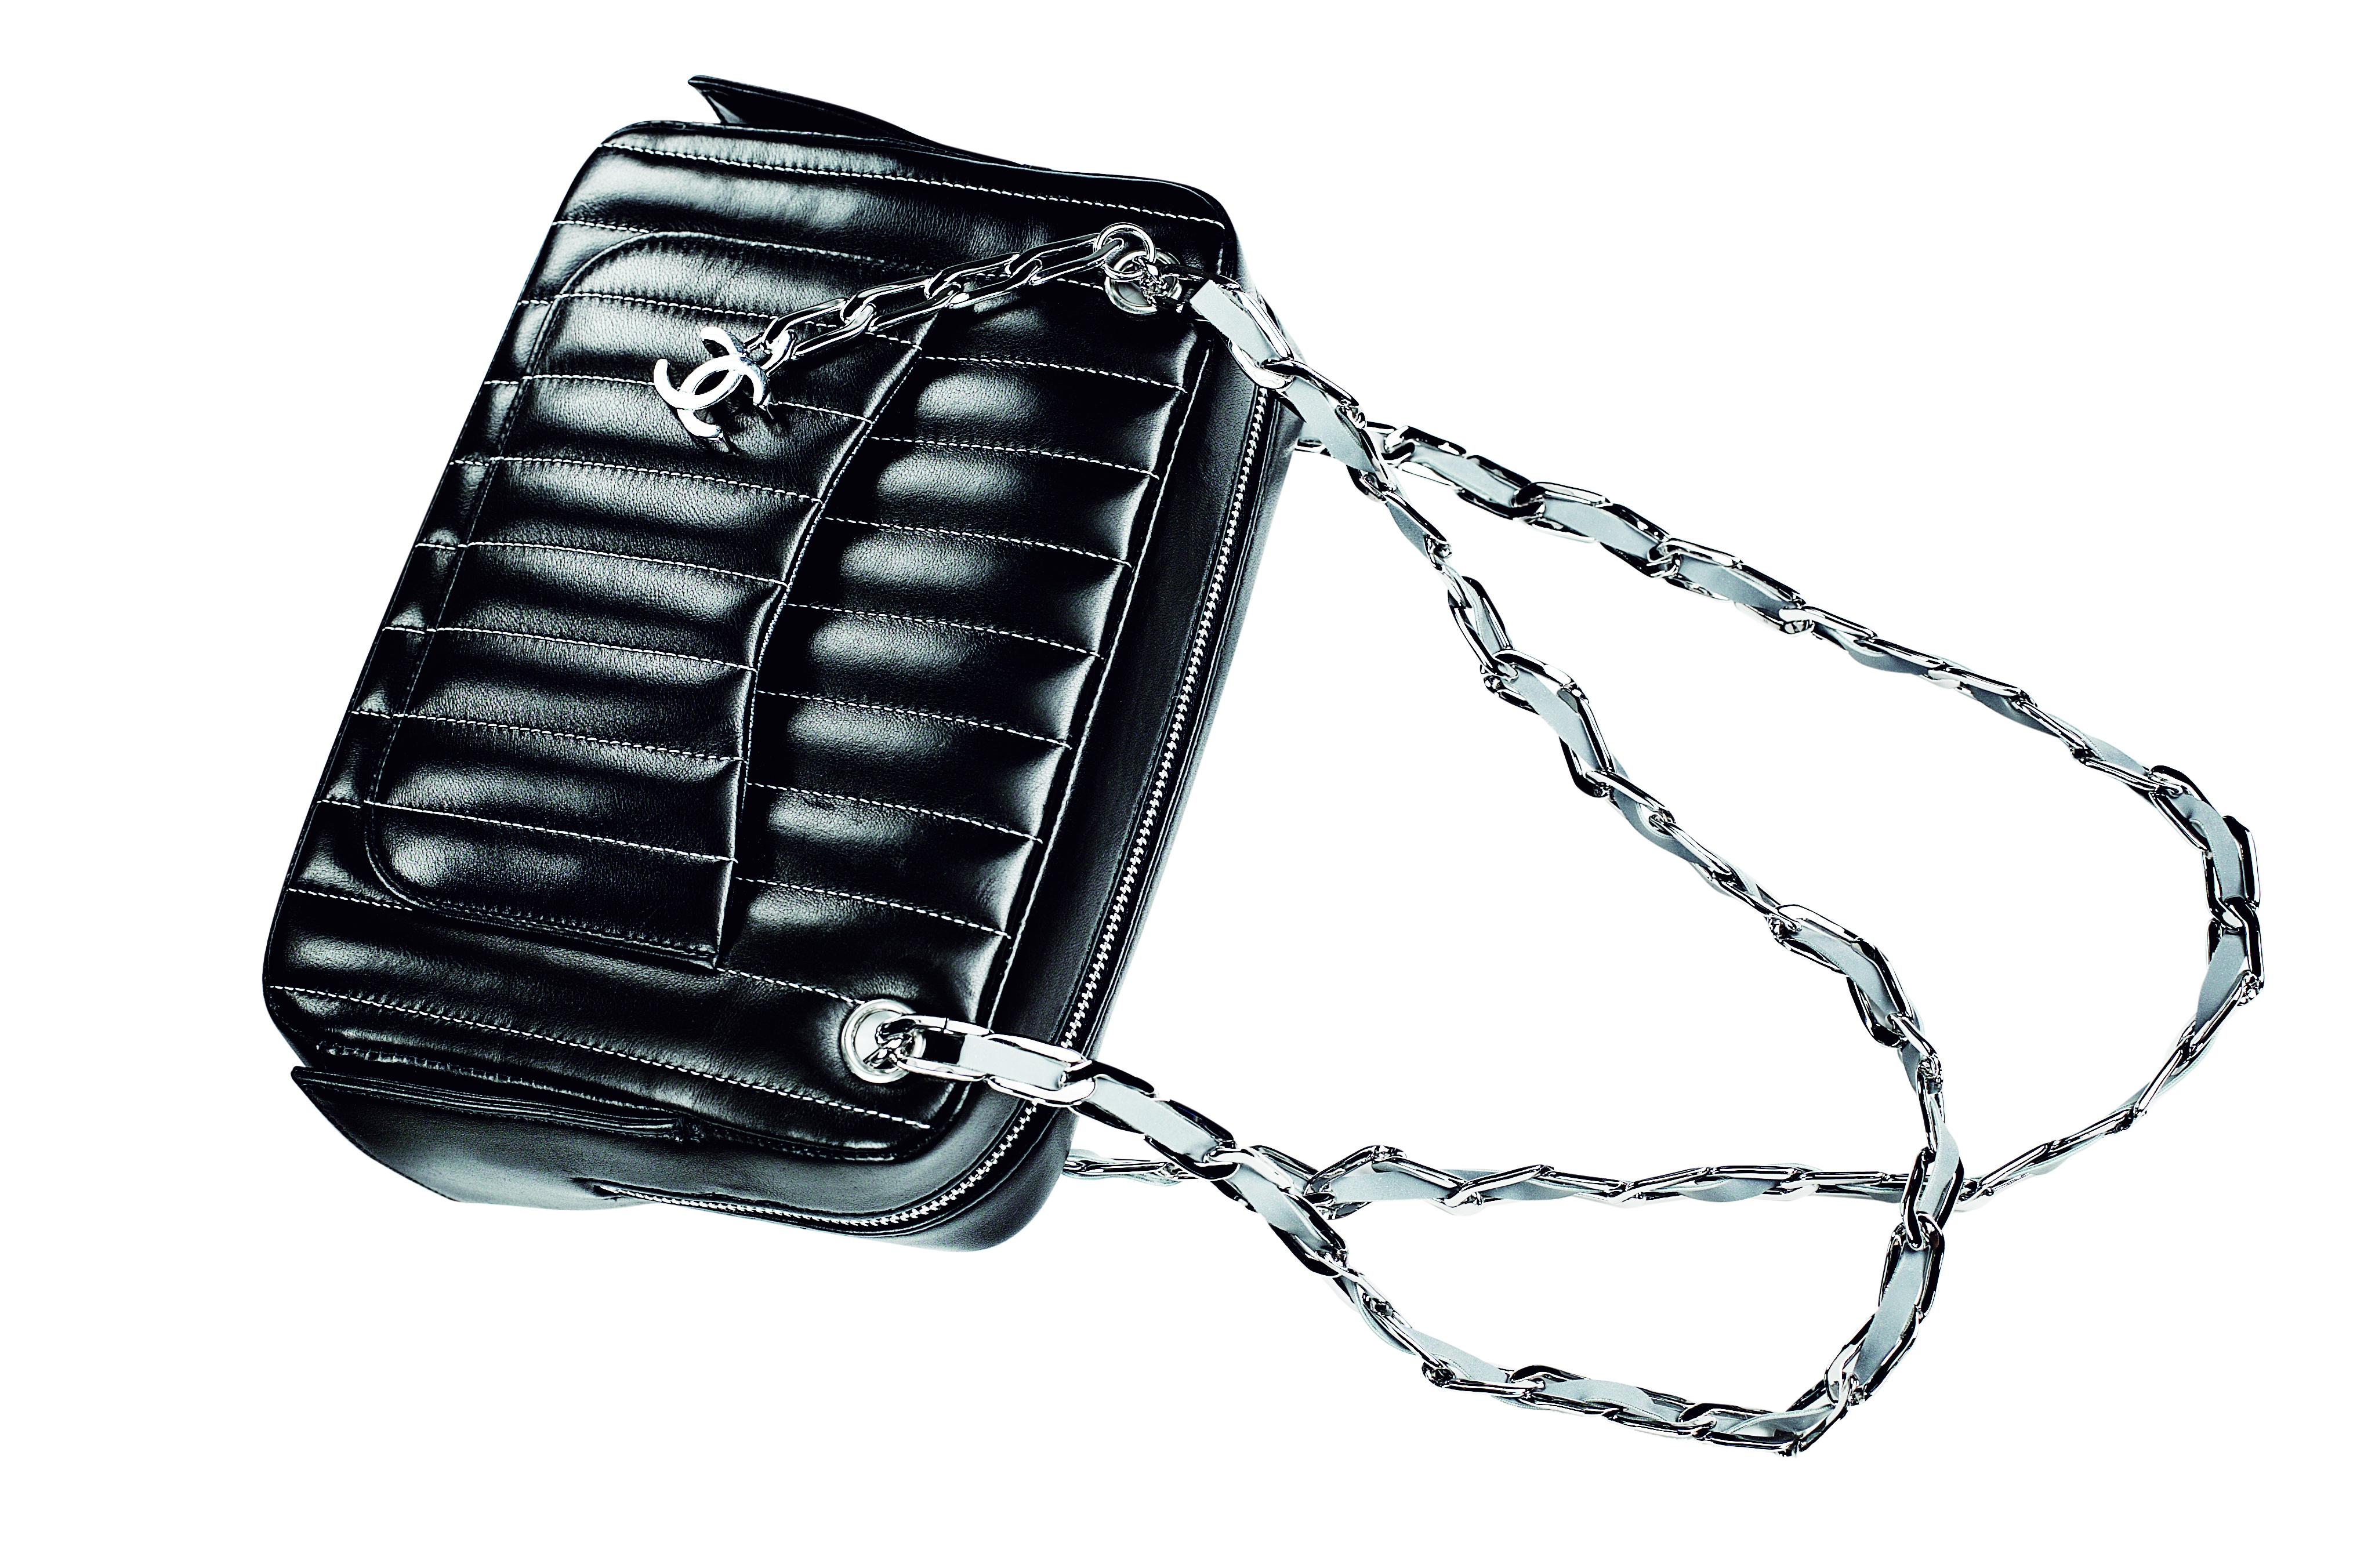 cc taske med hvid stik 990.jpg